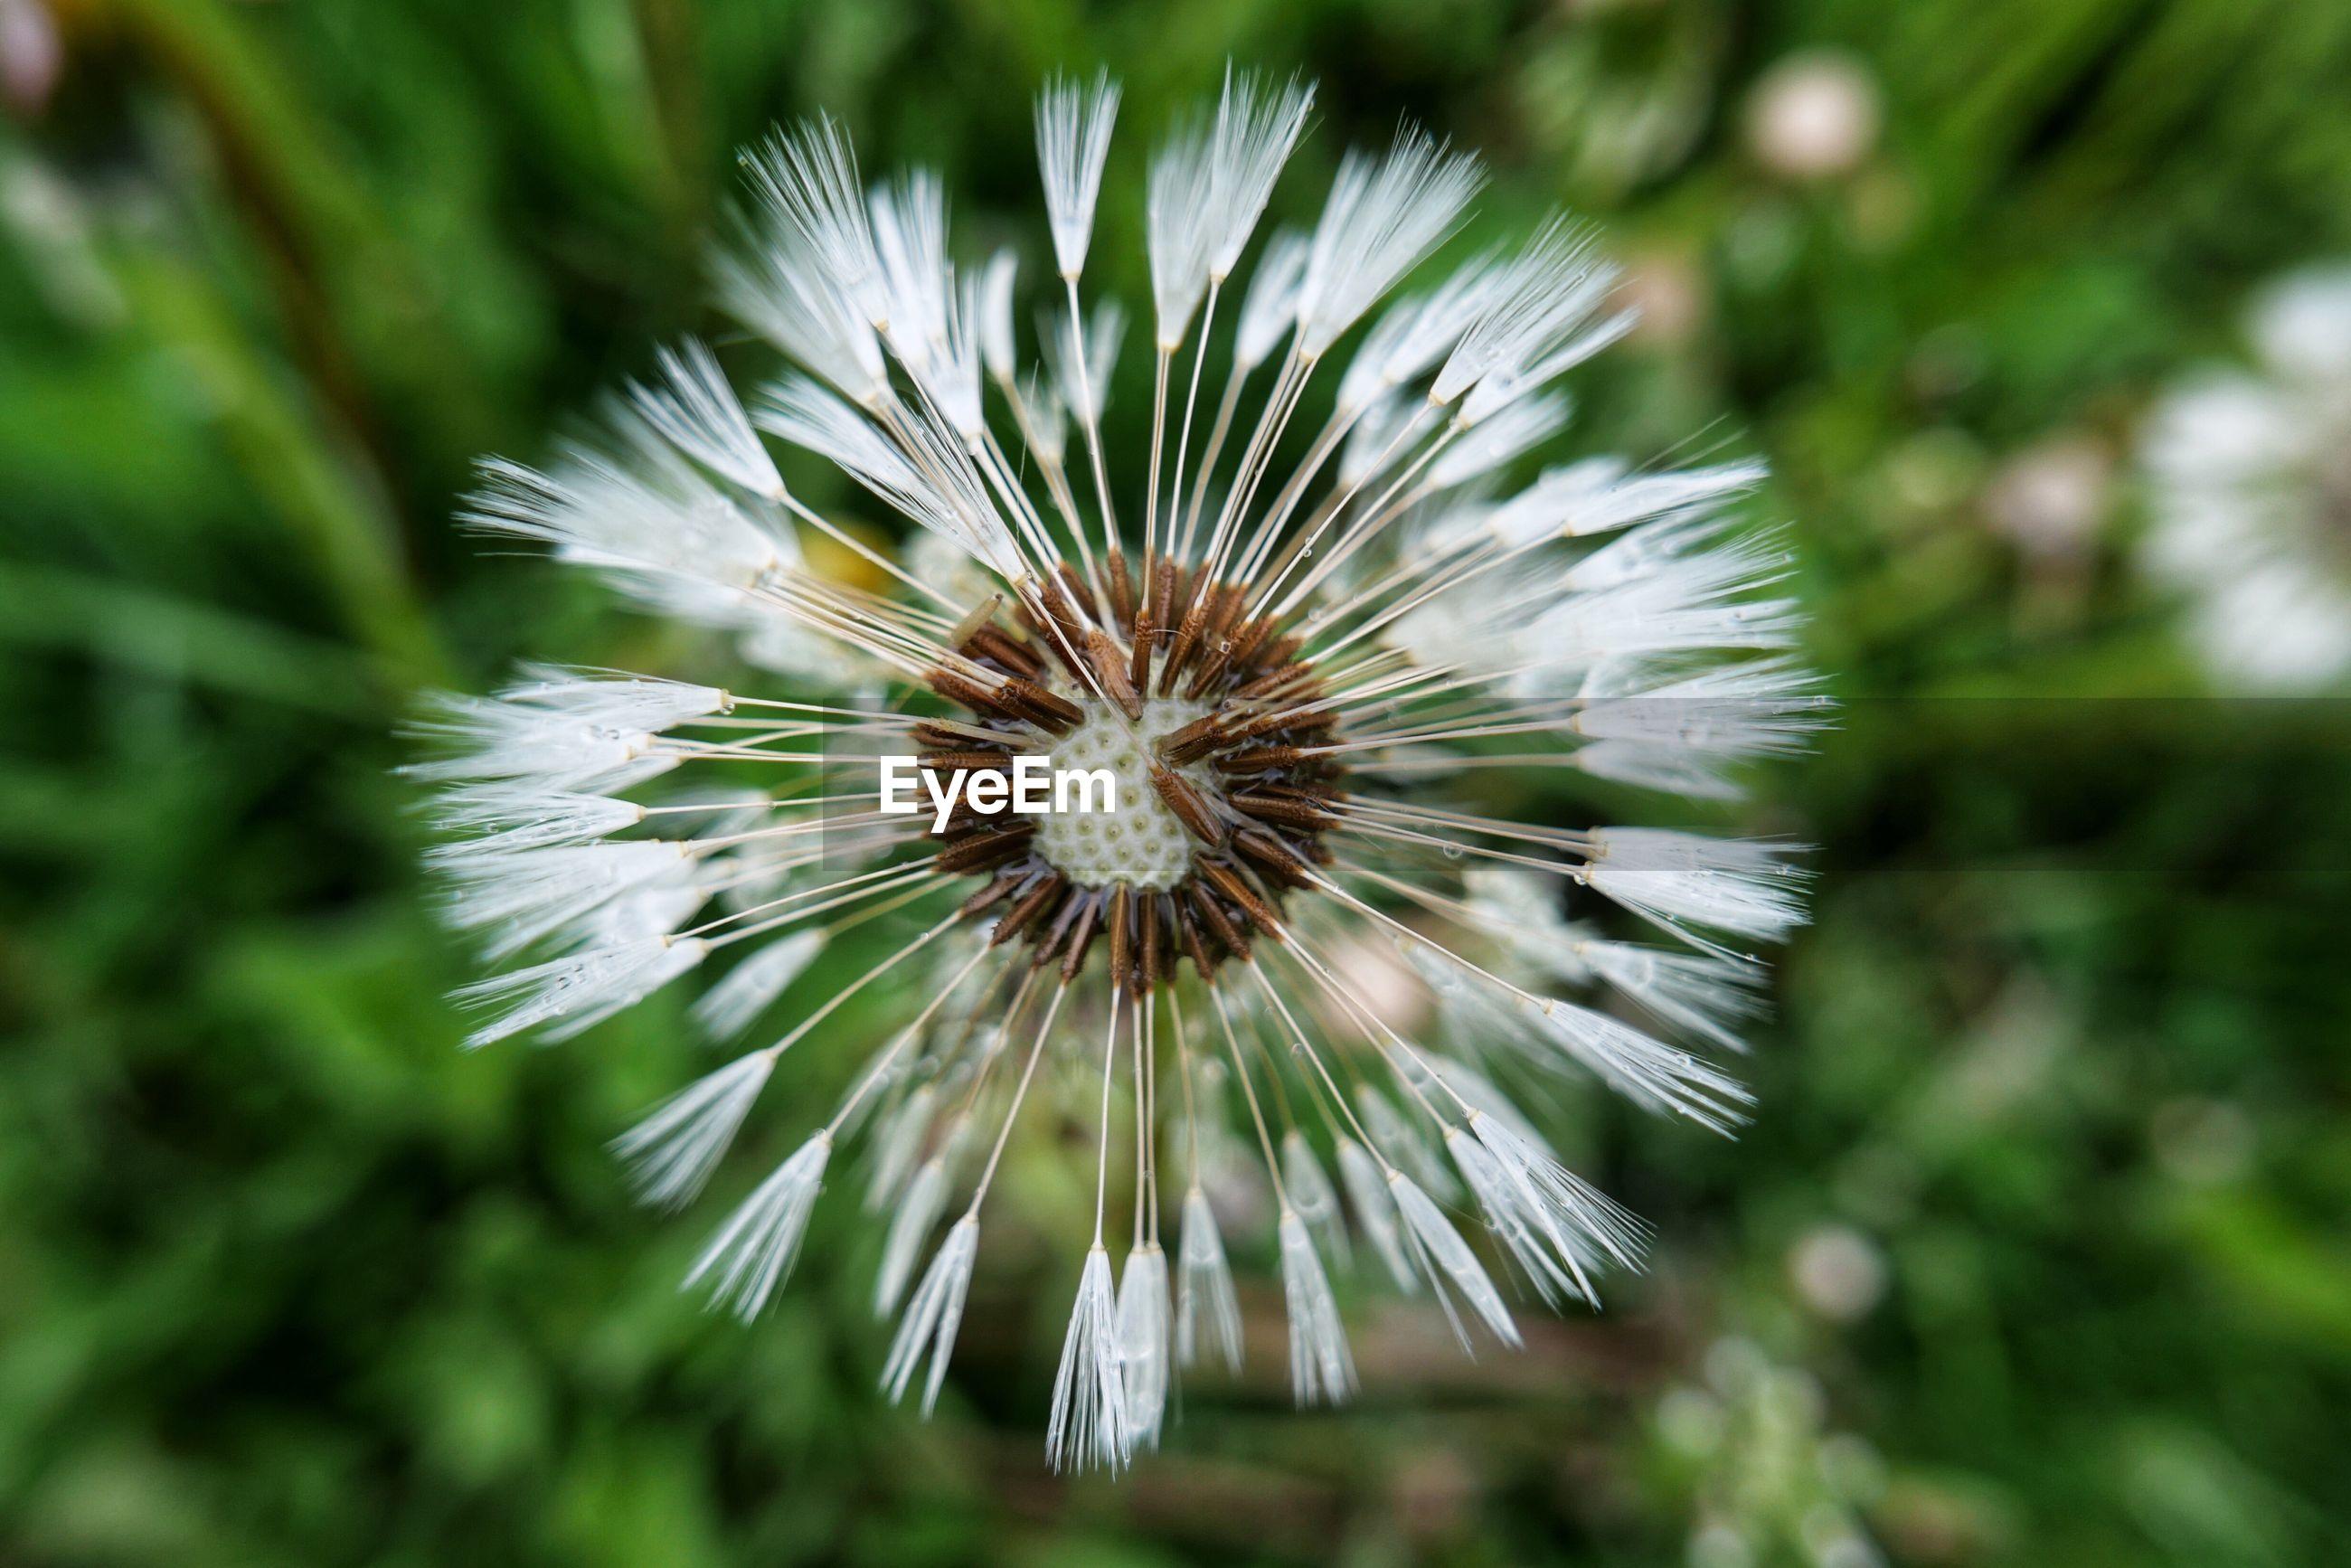 CLOSE-UP OF DANDELION AGAINST WHITE FLOWER